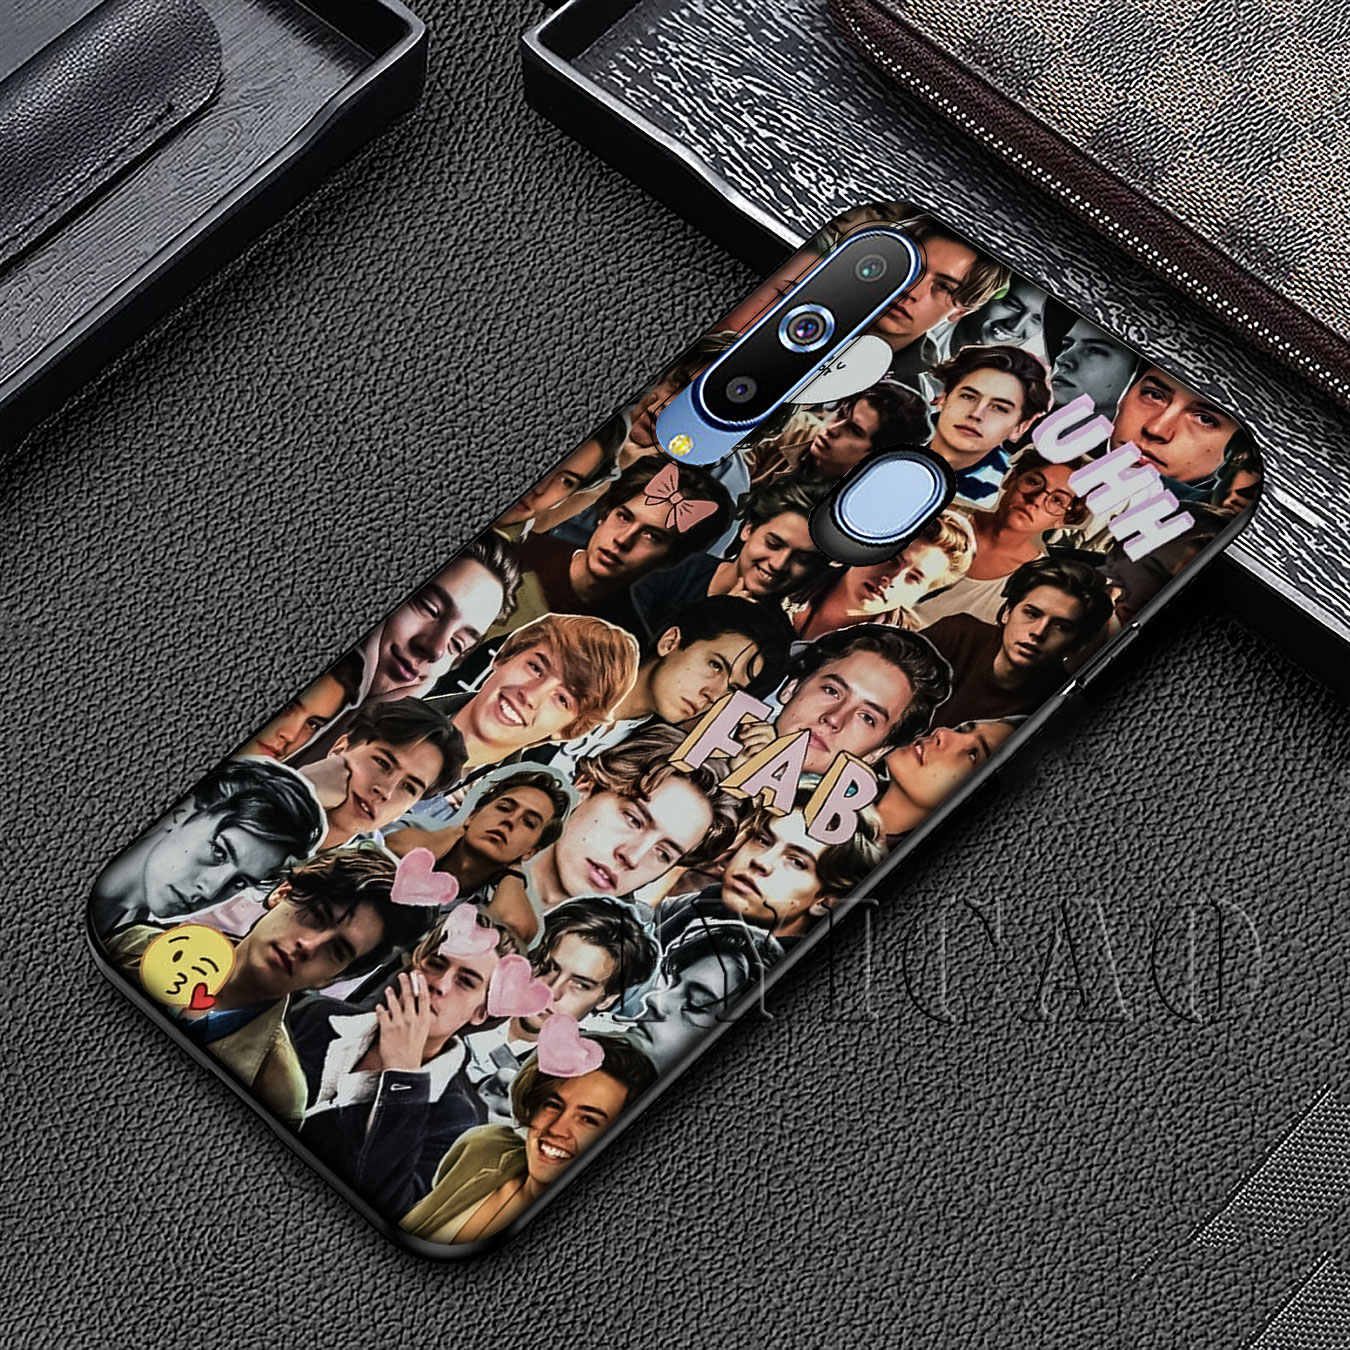 IYICAO ривердейл Cole Sprouse Мягкий силиконовый чехол для samsung Galaxy A70 A50 A40 A30 A10 M10 M20 M30 черная крышка